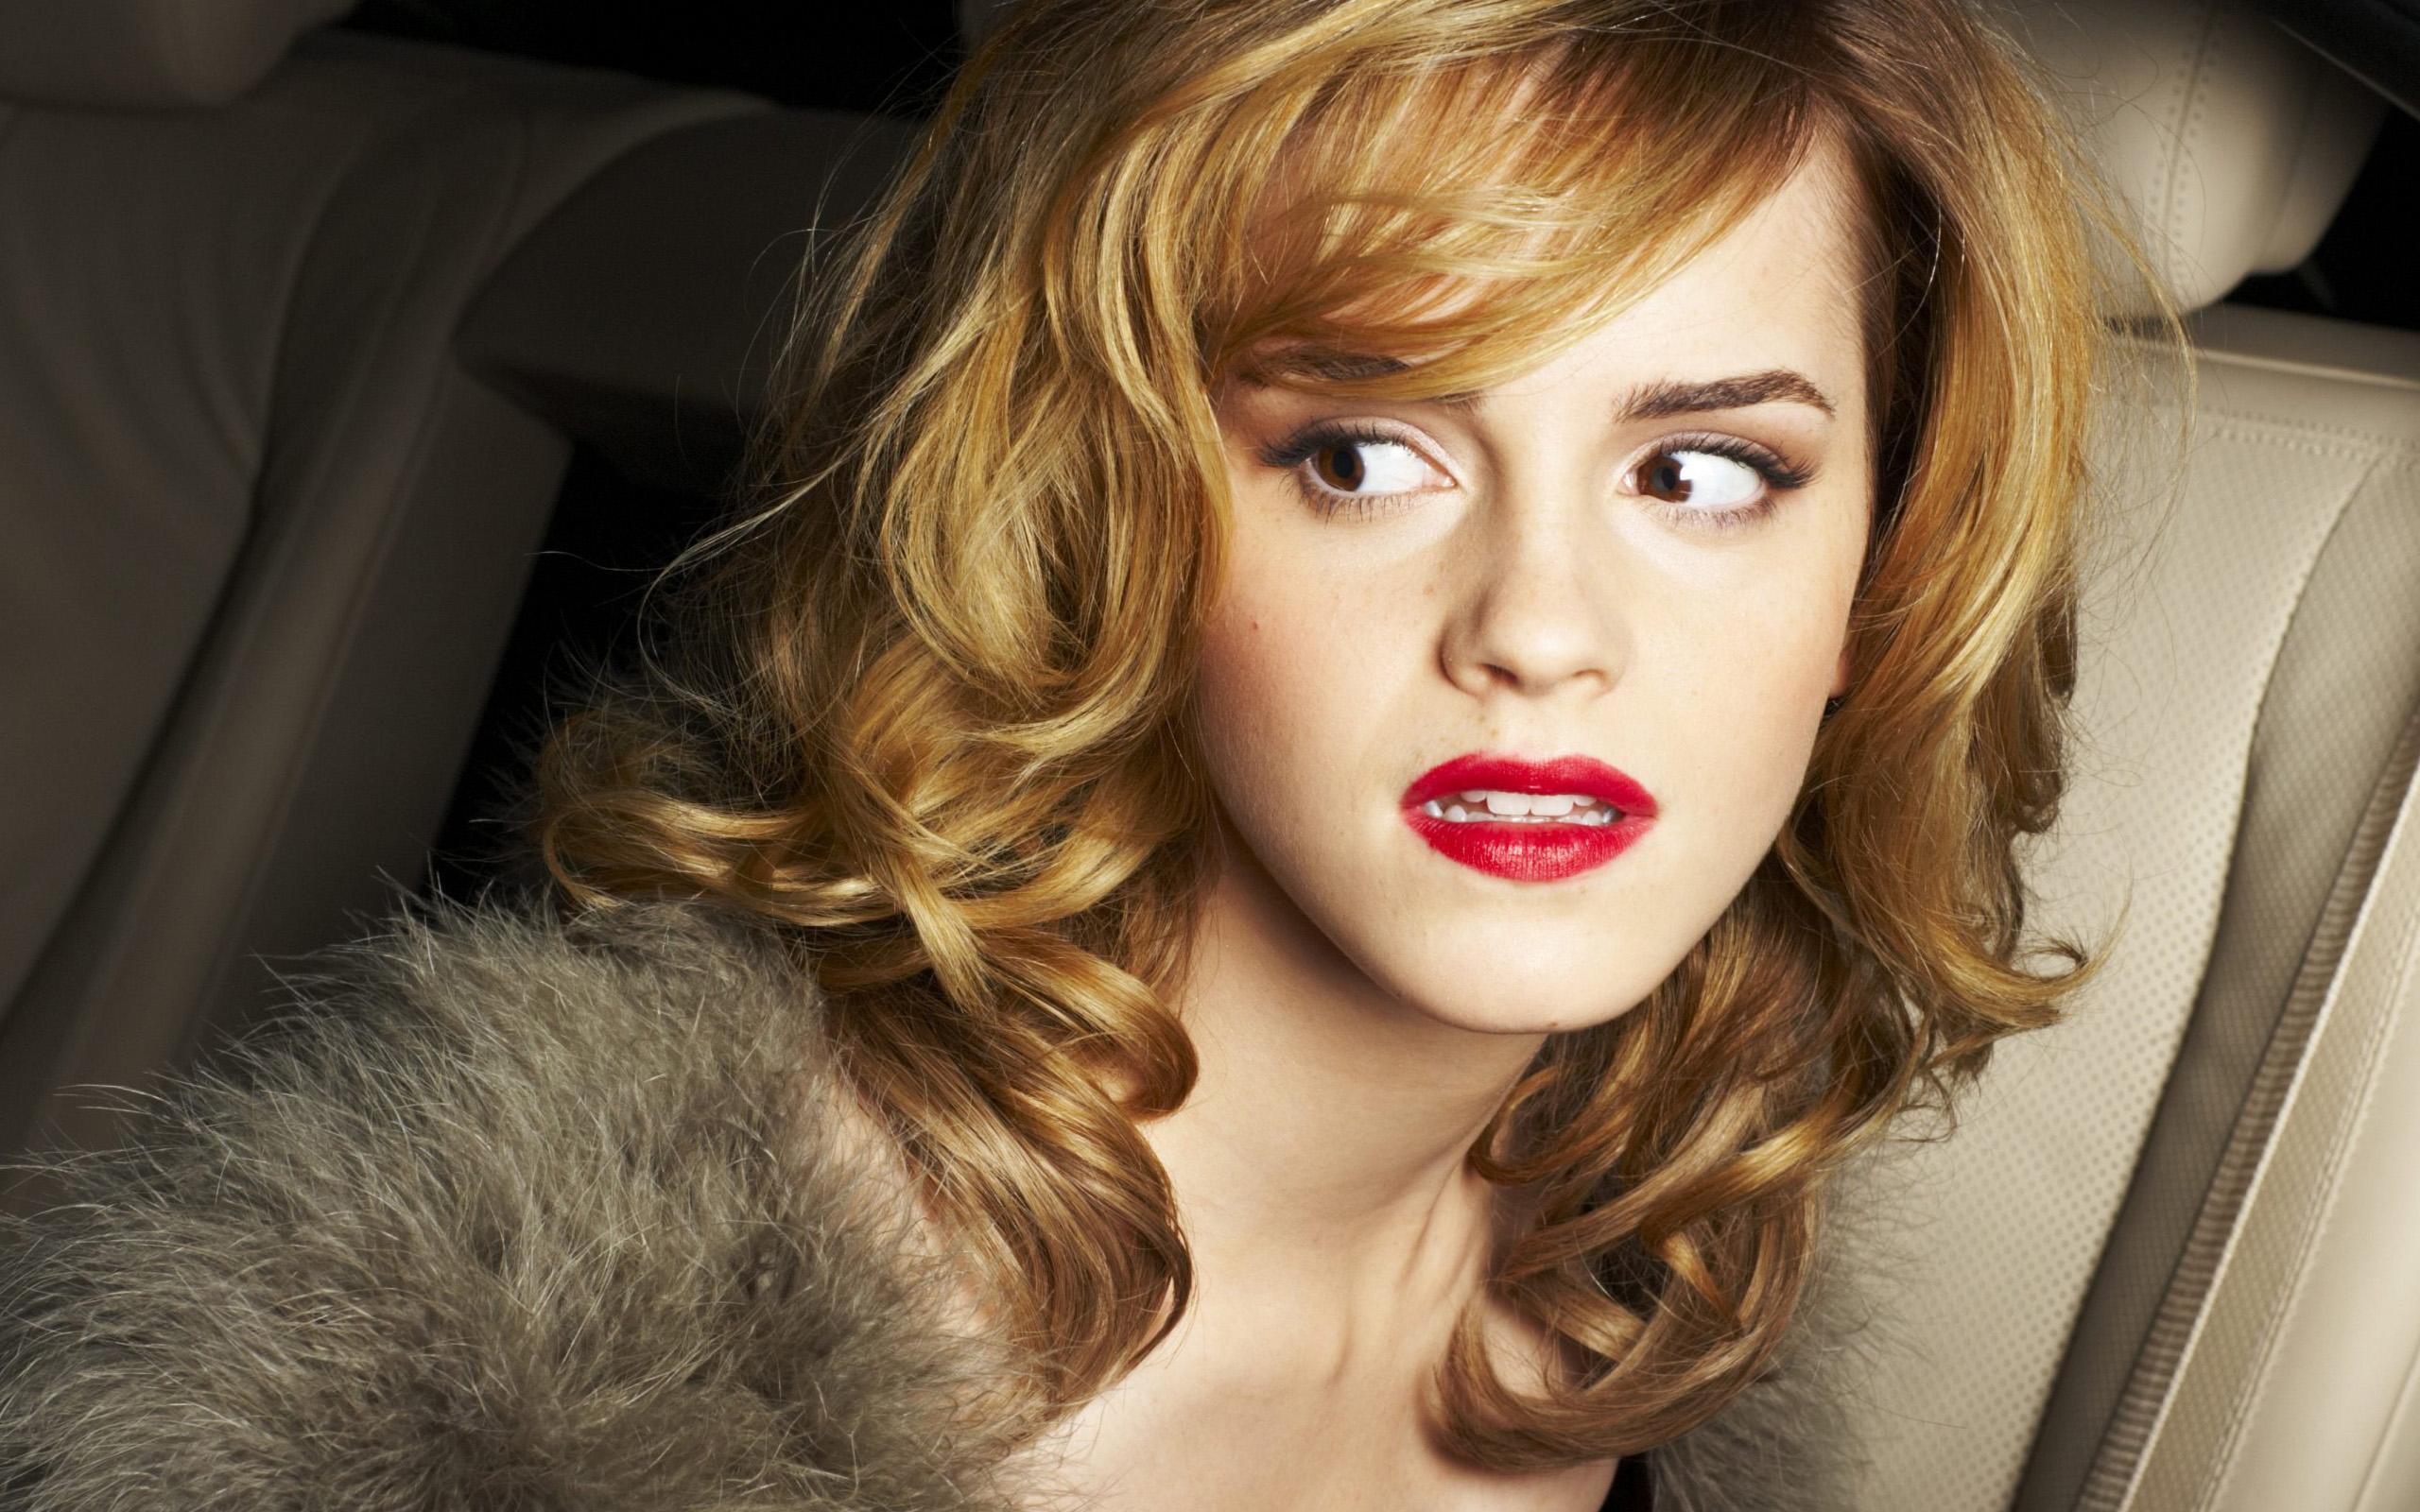 Emma Watson 2009 Widescreen Wallpapers HD Wallpapers 2560x1600